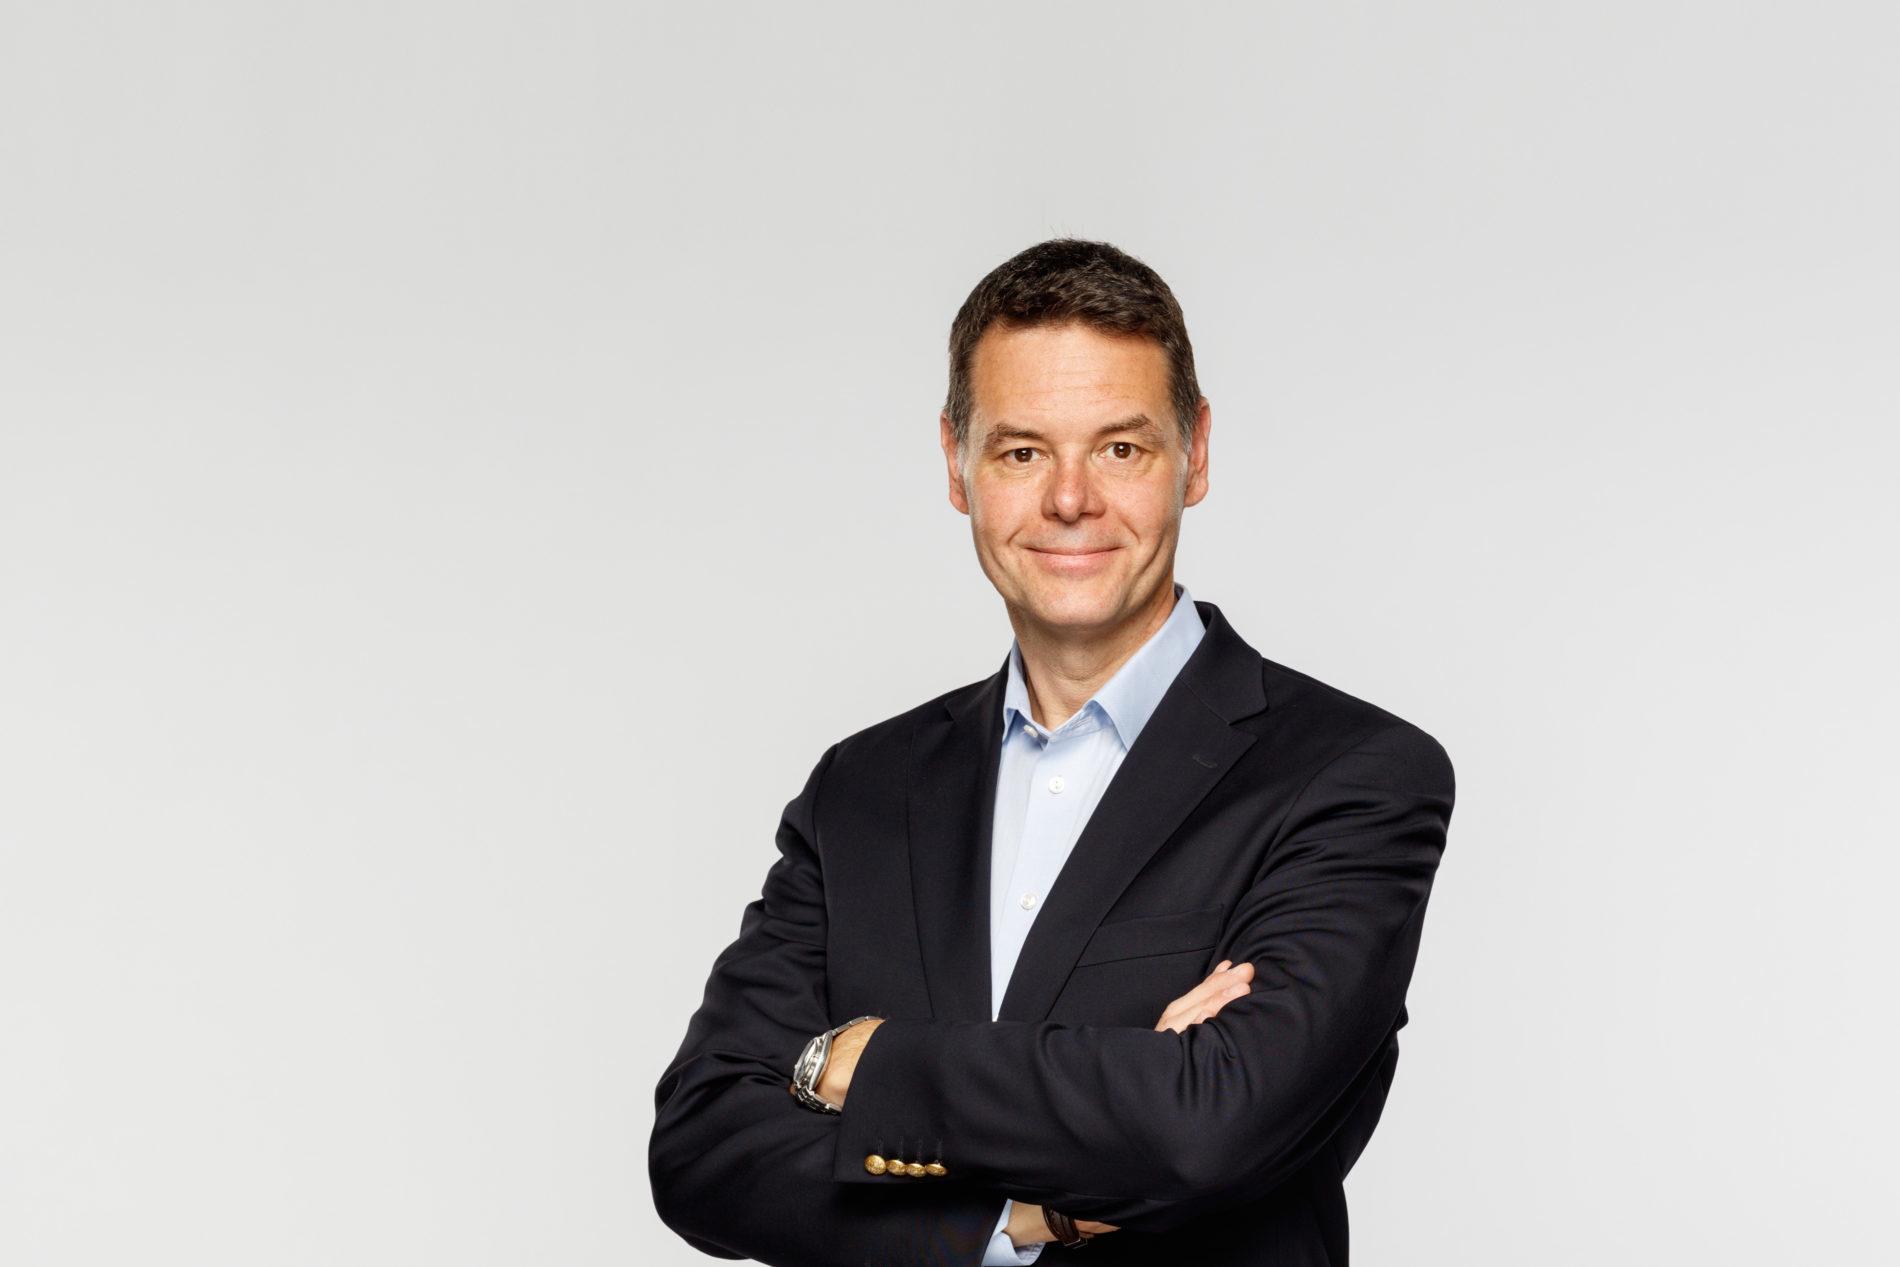 Robert Felczak